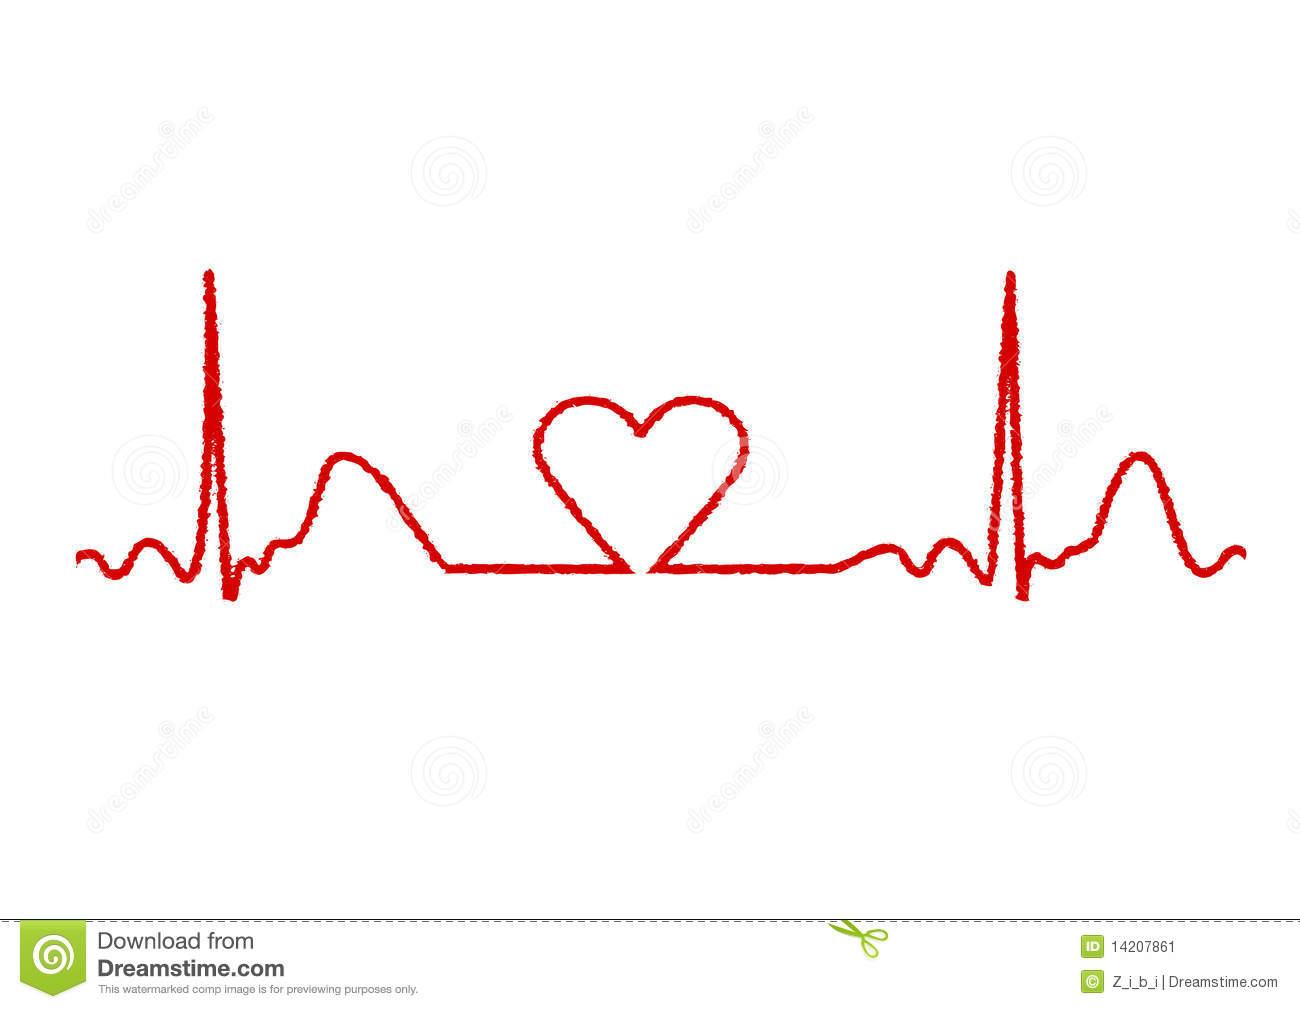 Ekg Clip Art Tumundografico 5. Illustrat-Ekg clip art tumundografico 5. Illustration Of Electrical Activity Of The Human Heart-13